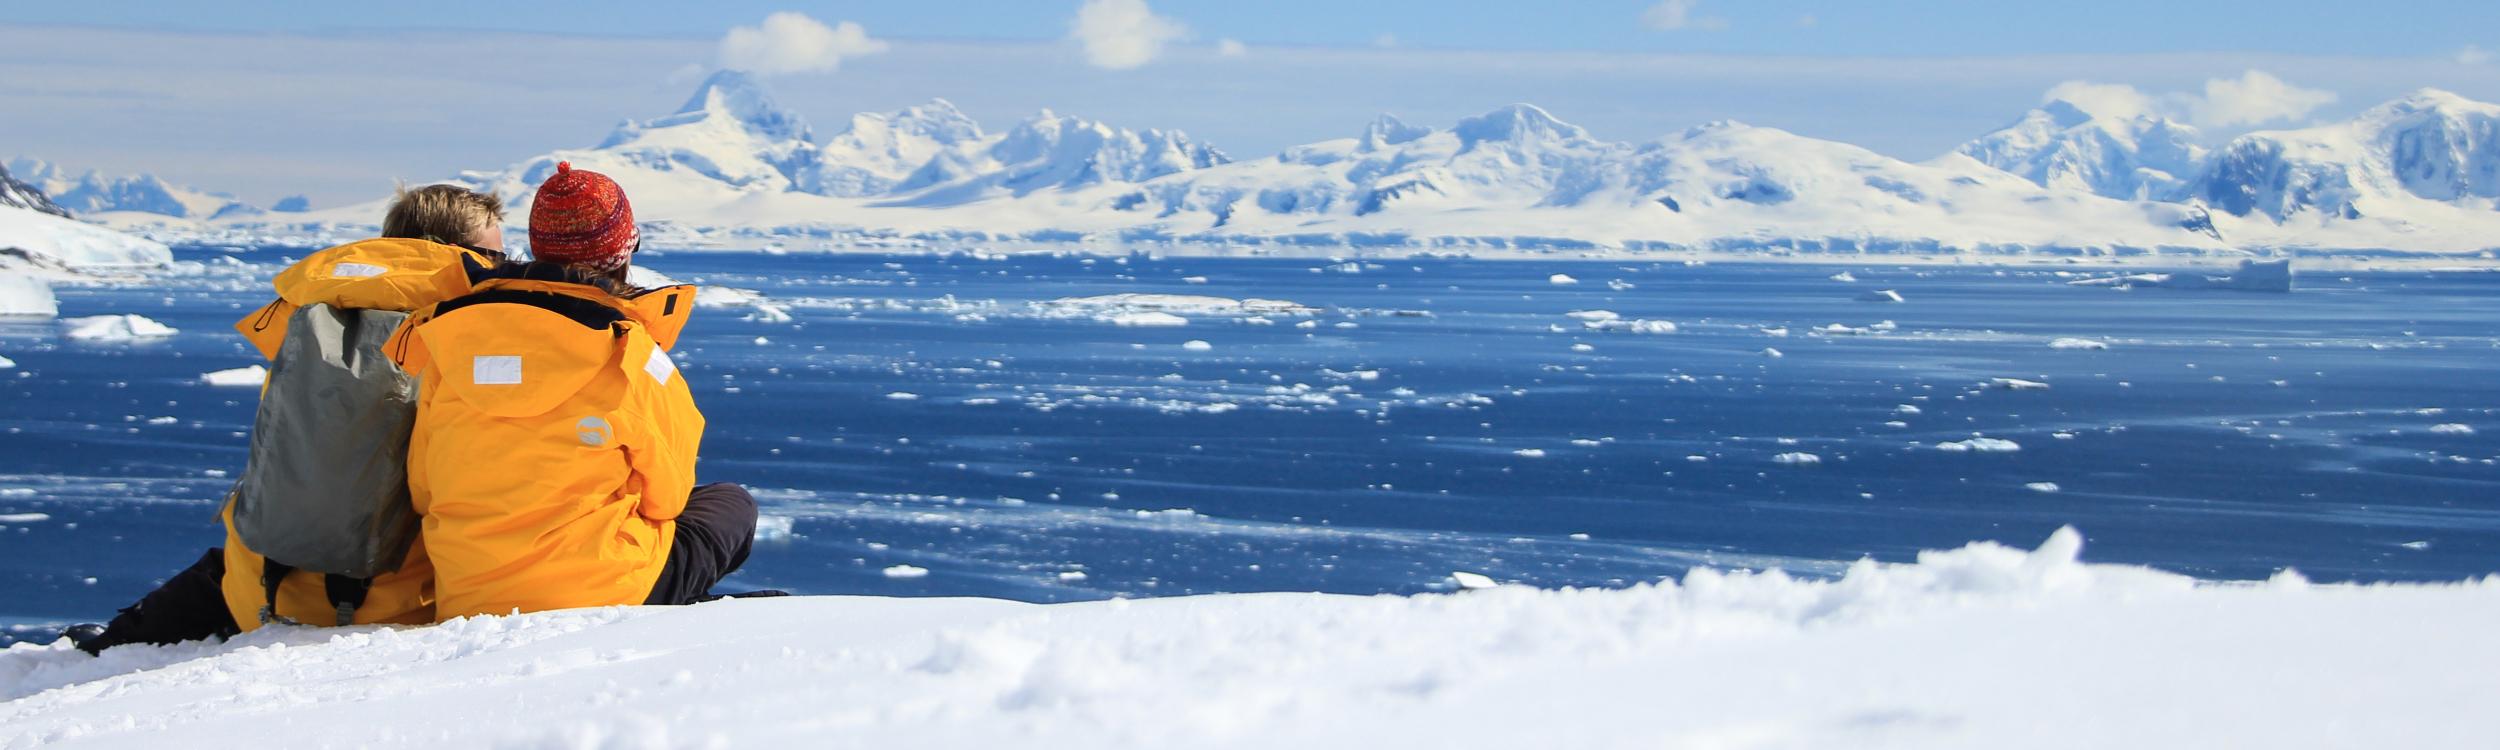 Antarctica explorers